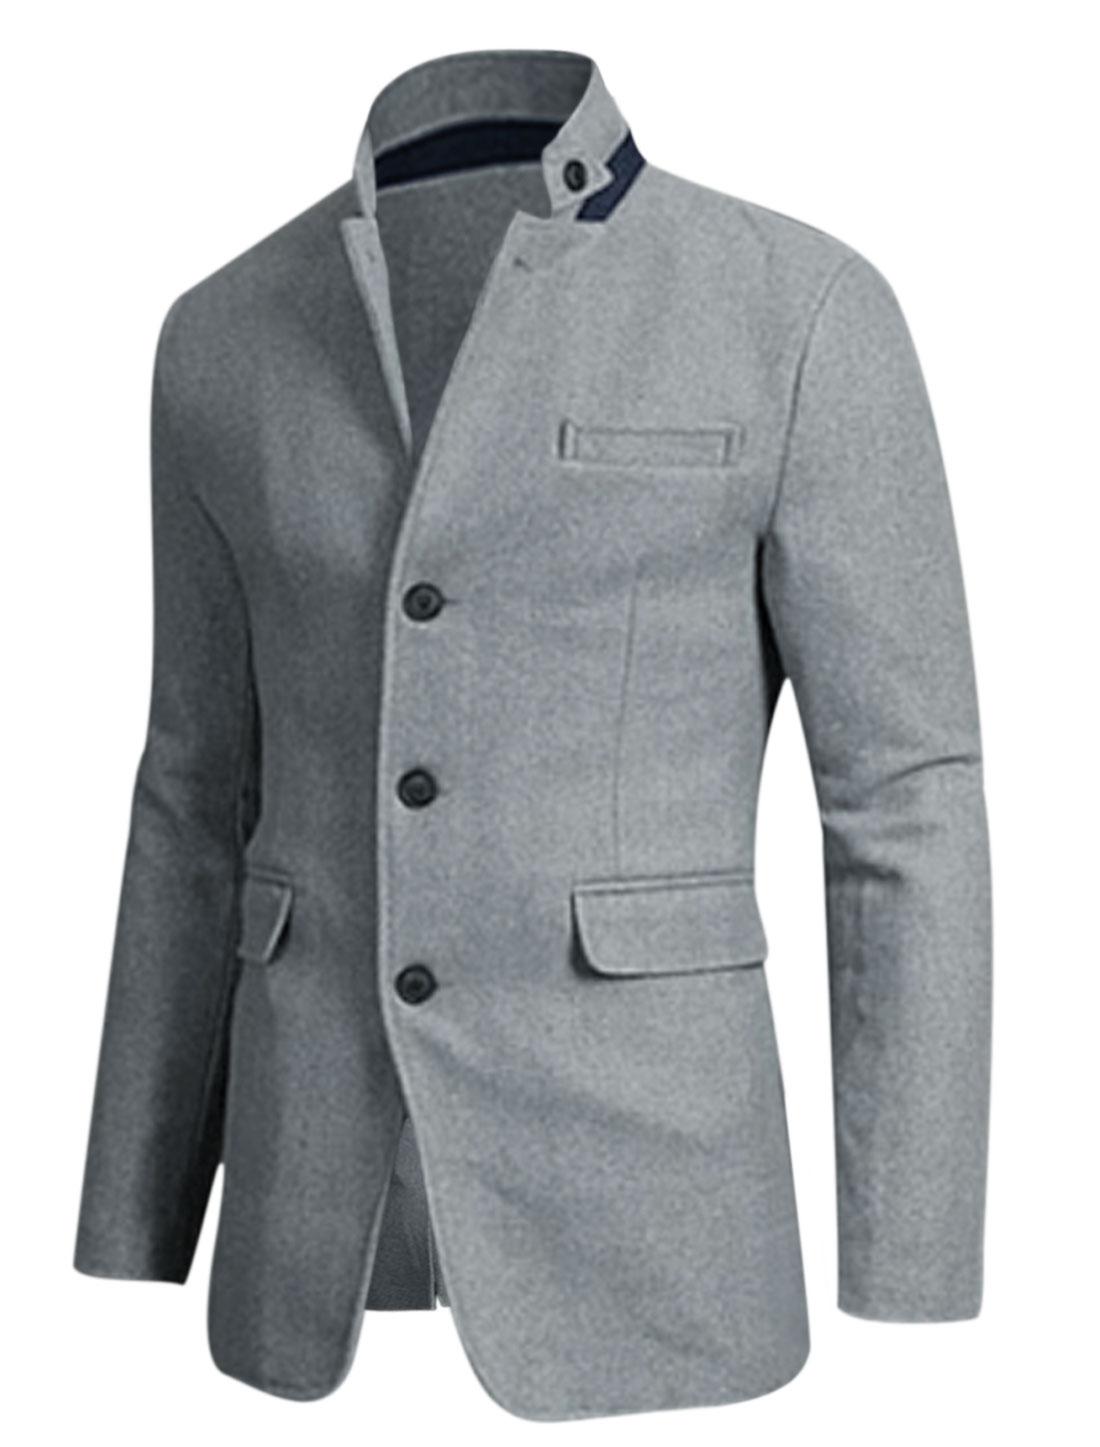 Men Light Gray Button Closure Front Pockets Slim Cut Split Back Worsted Jacket M